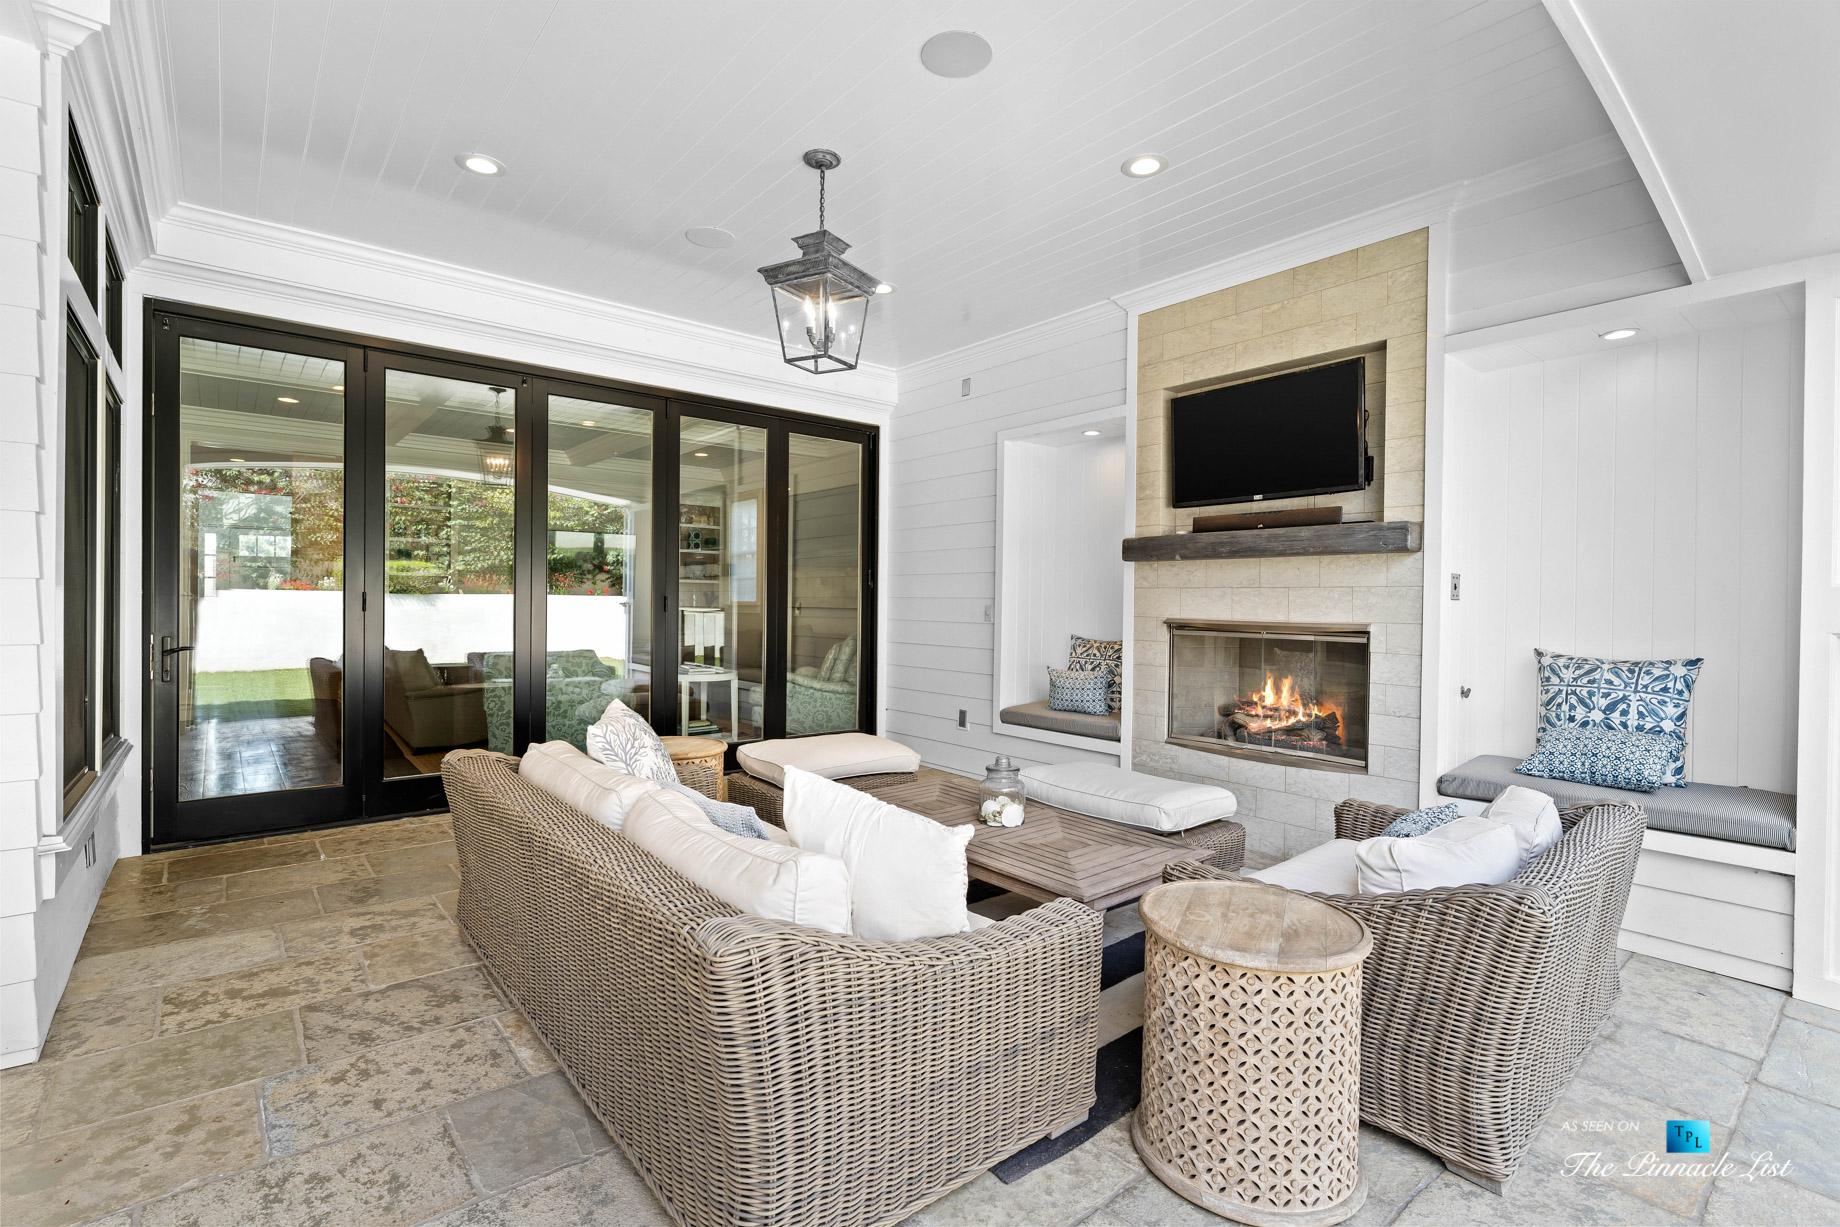 1412 Laurel Ave, Manhattan Beach, CA, USA – Backyard Lounge